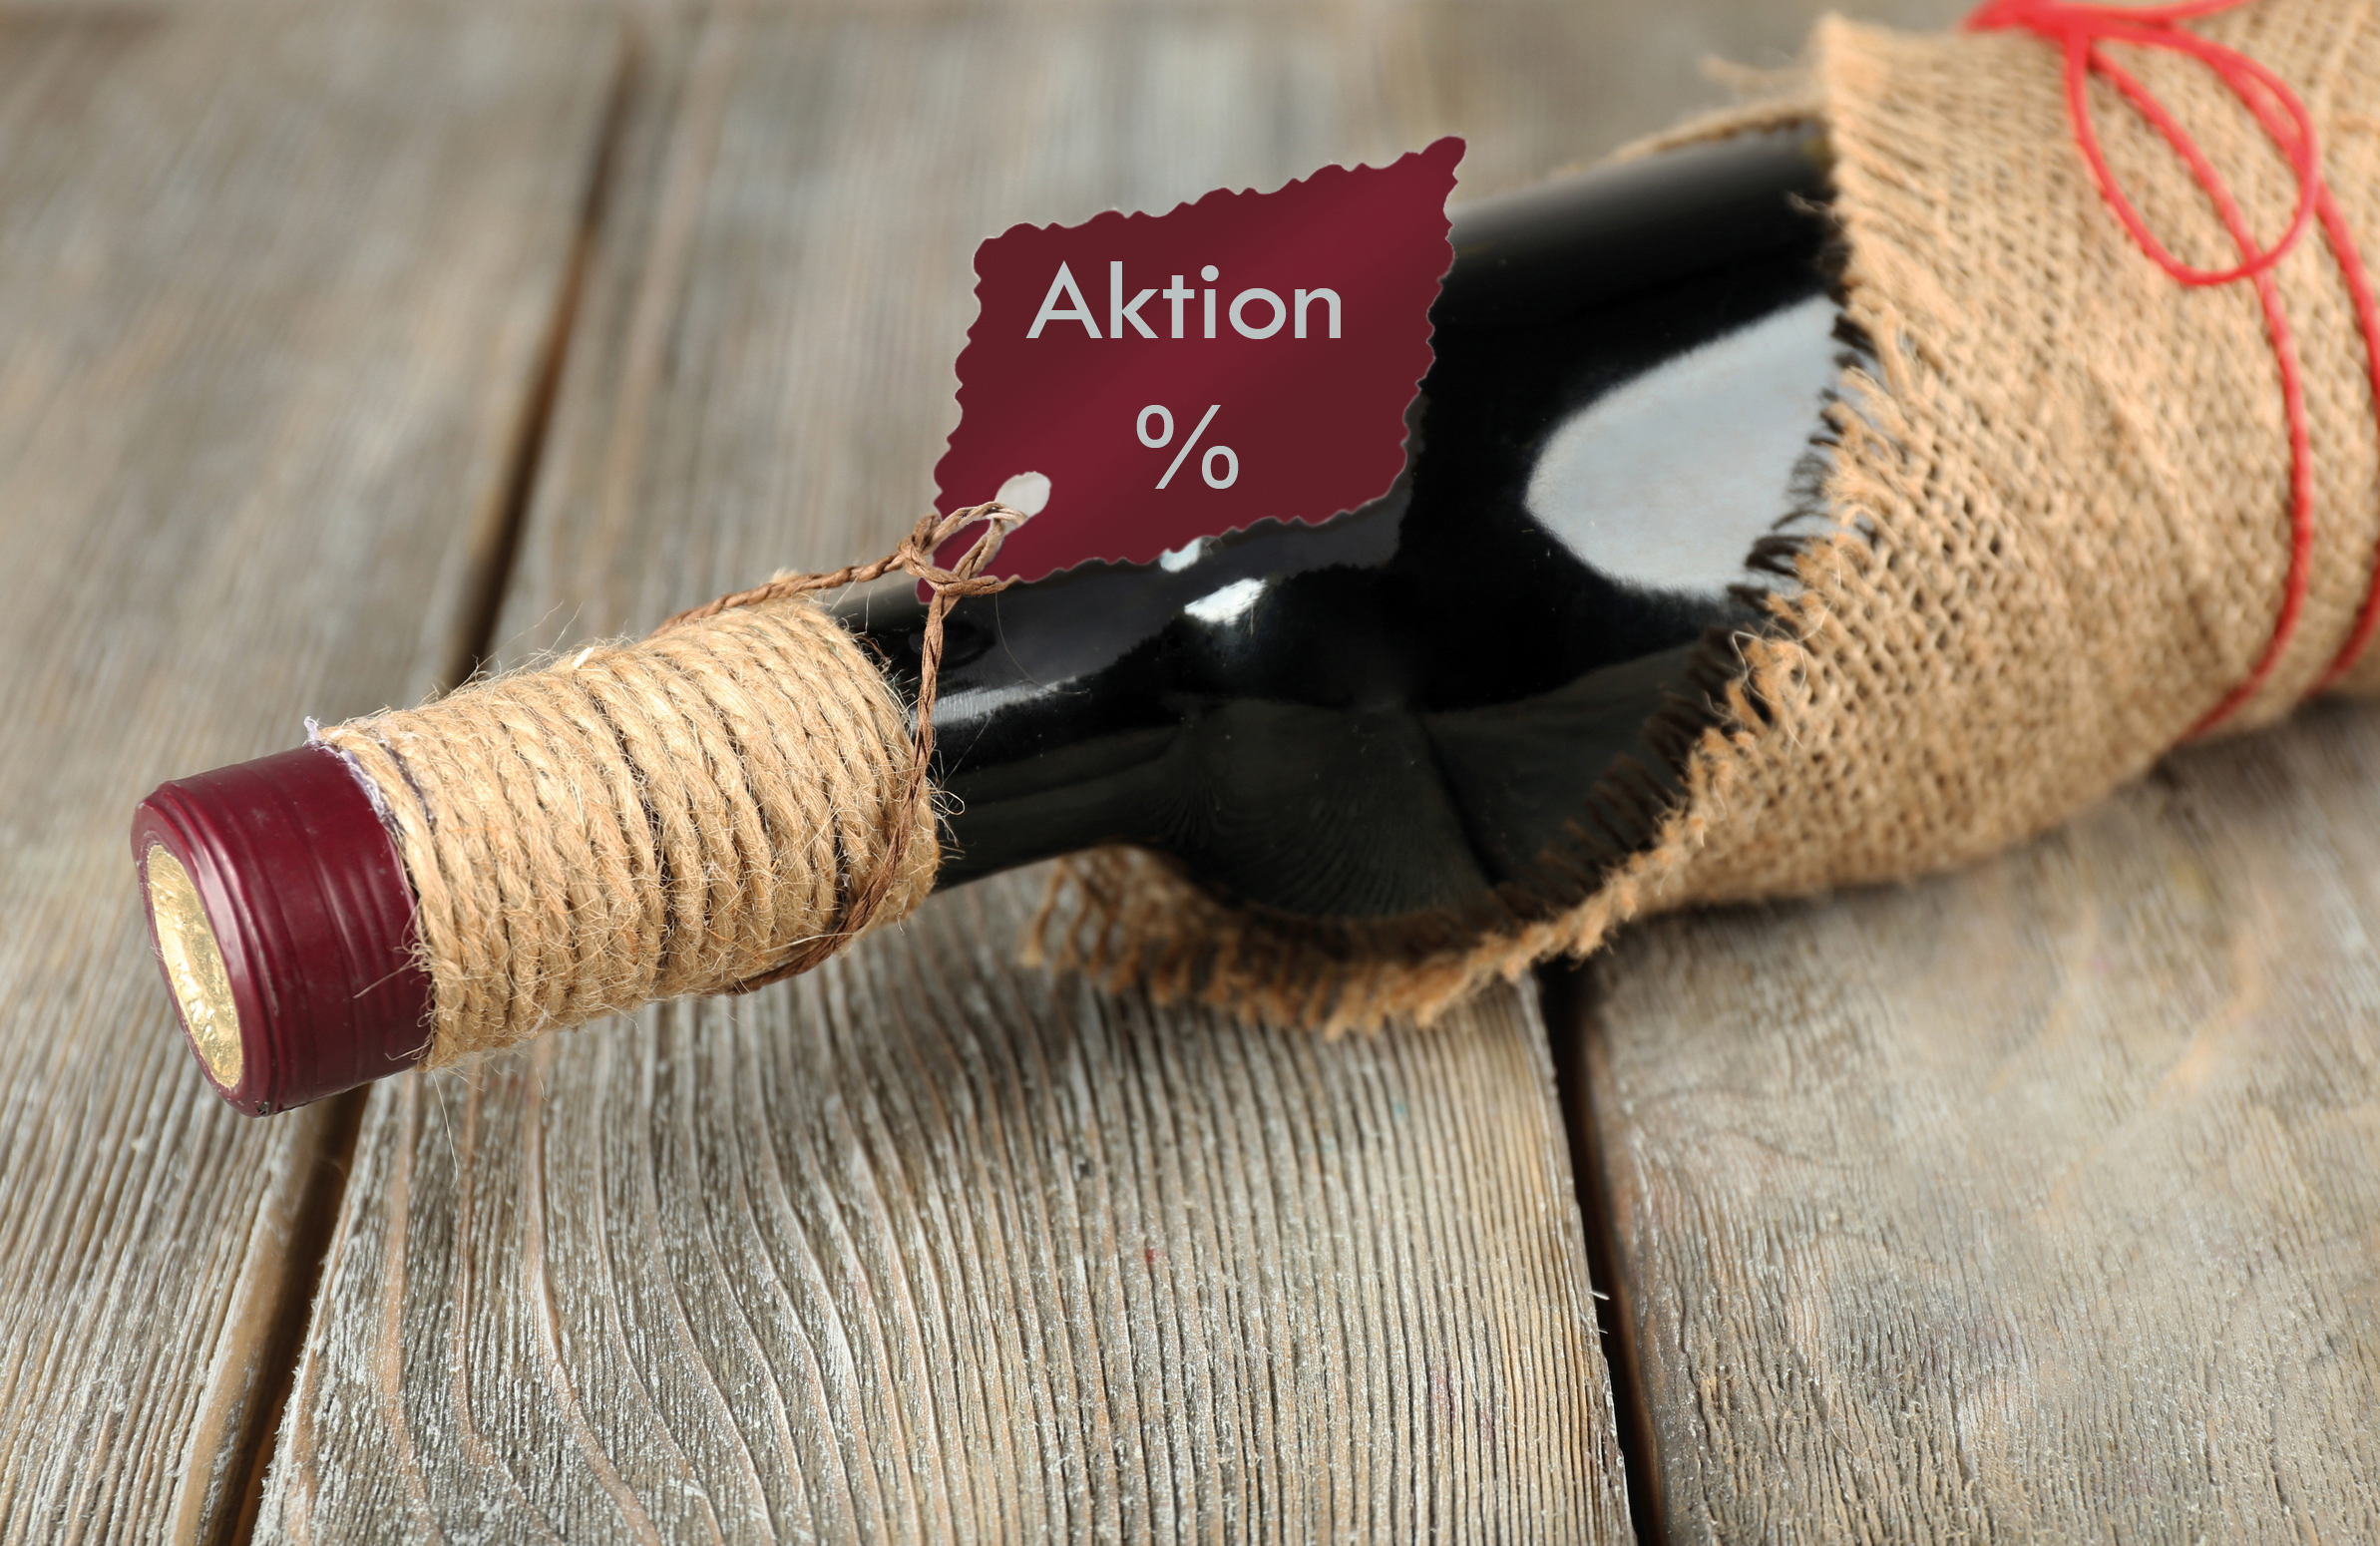 % Aktionen